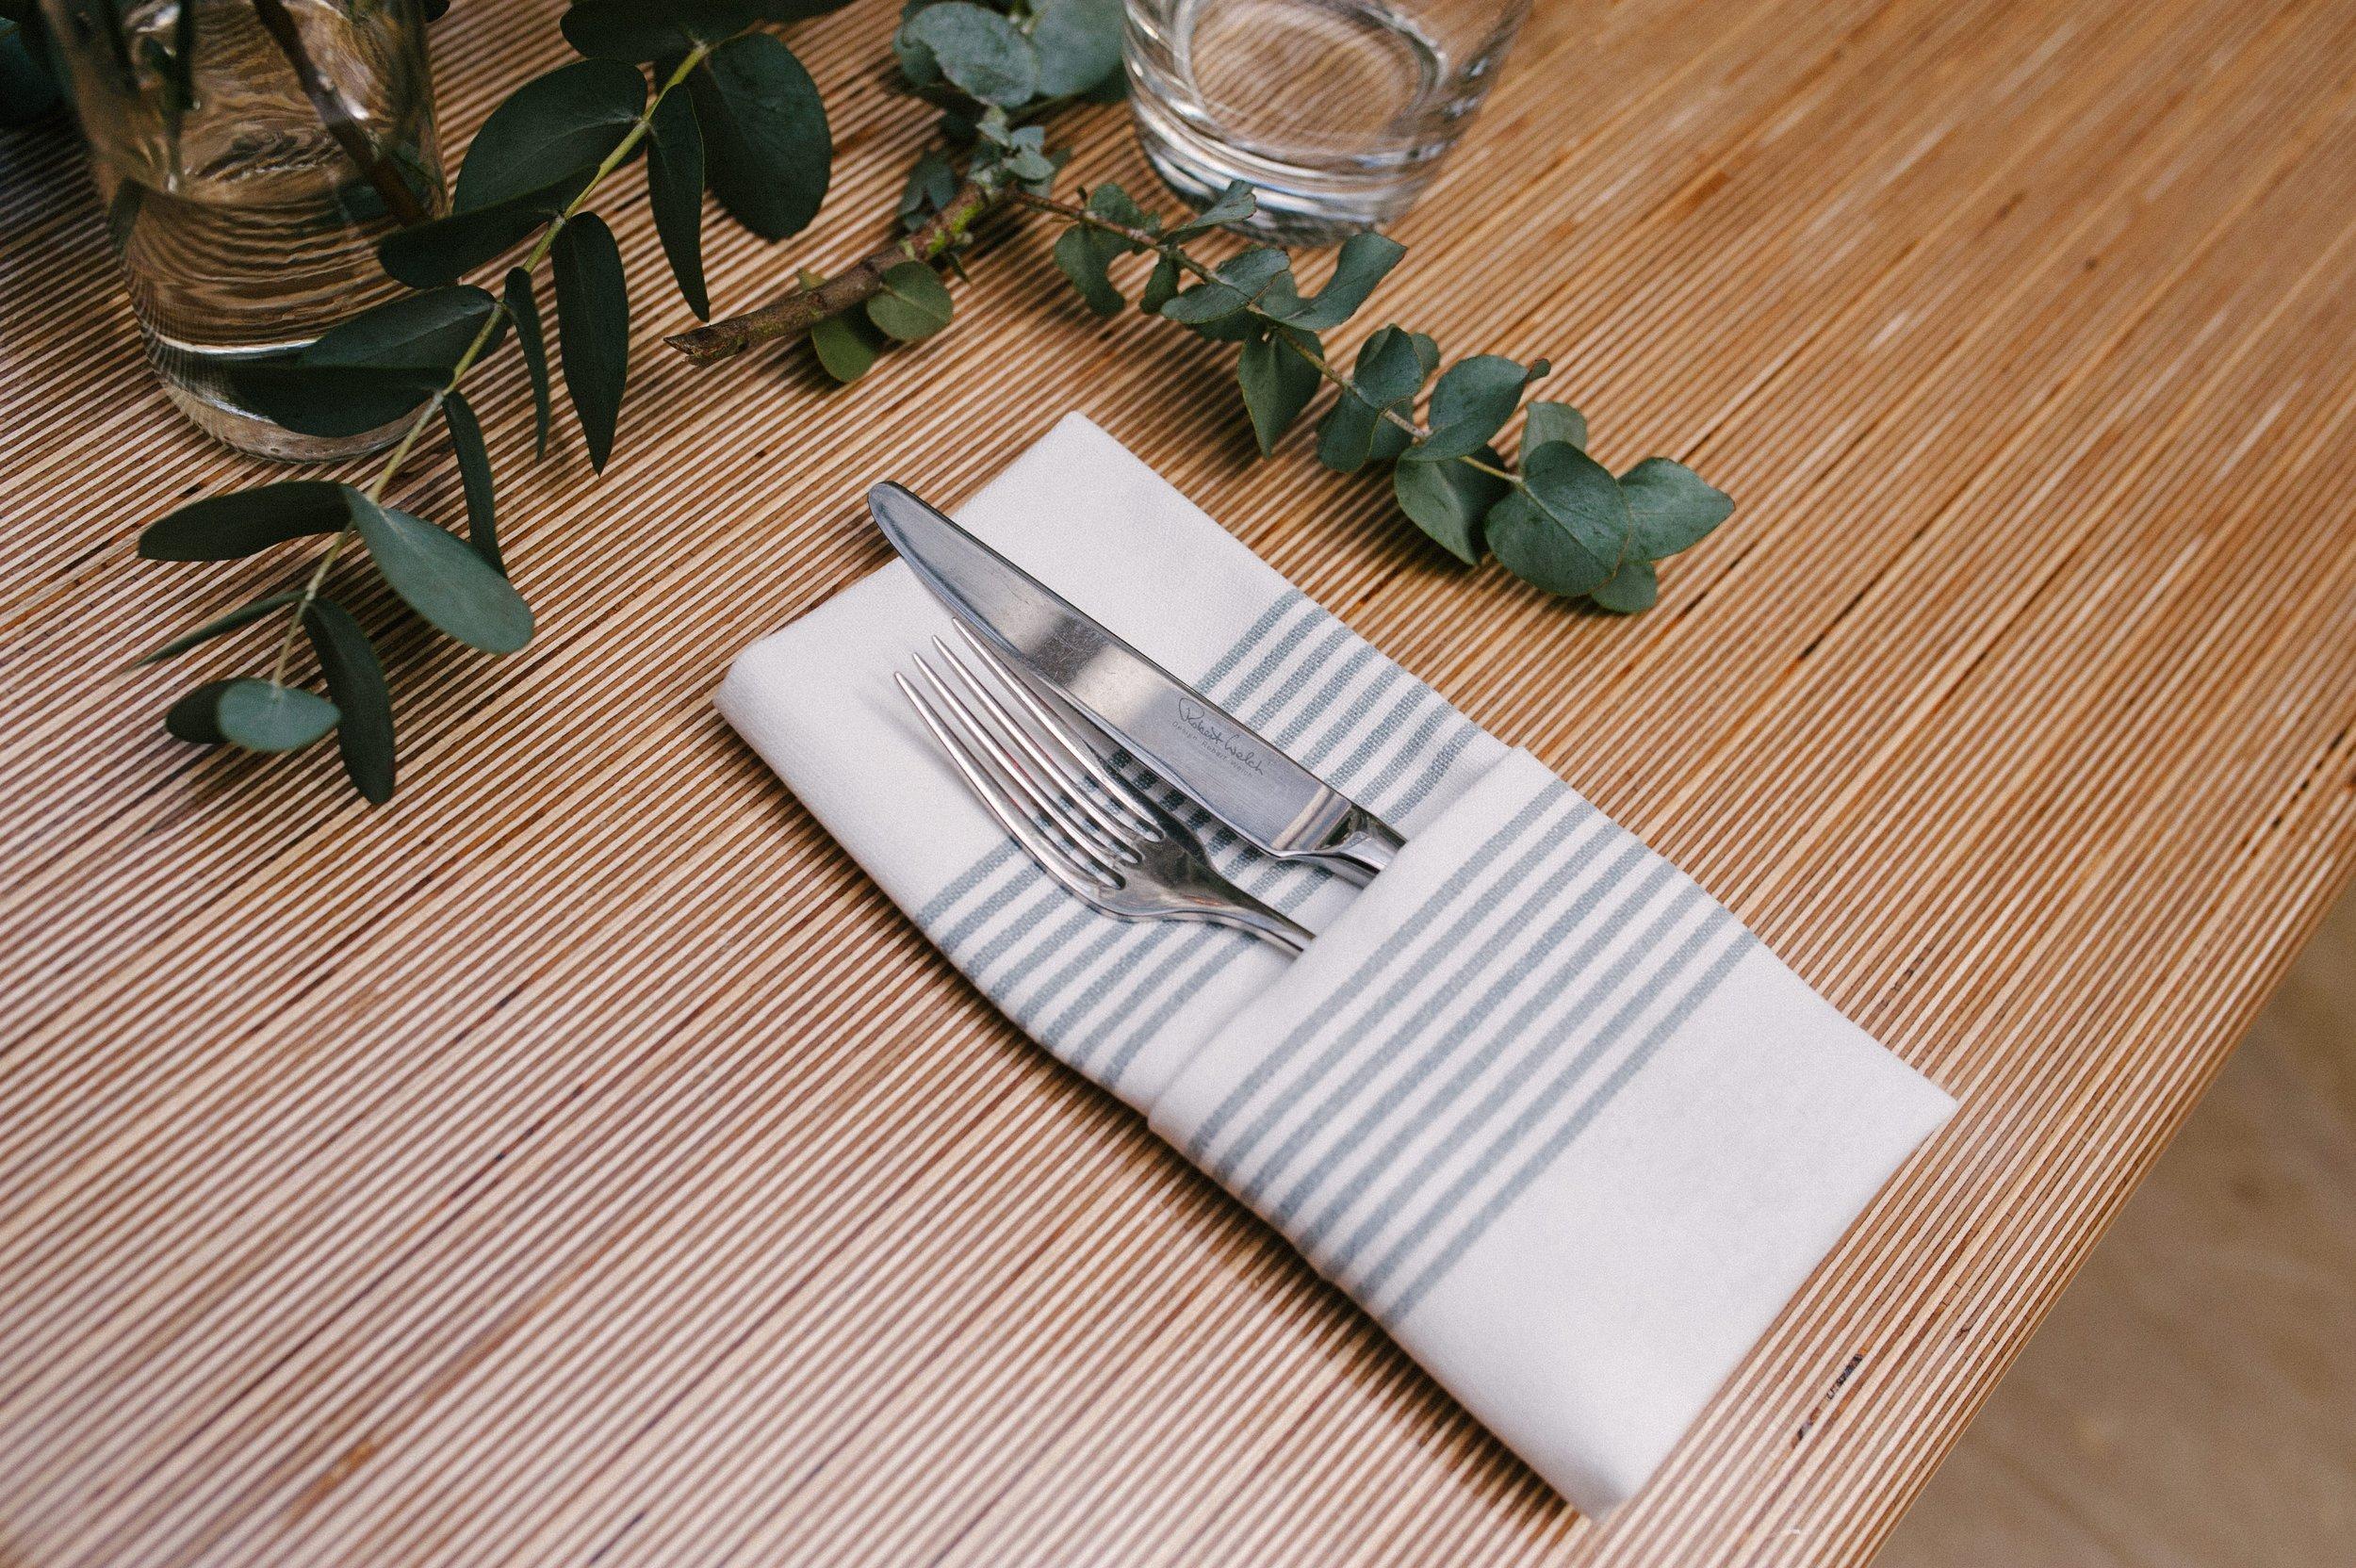 cutlery-design-fork-1166371.jpg